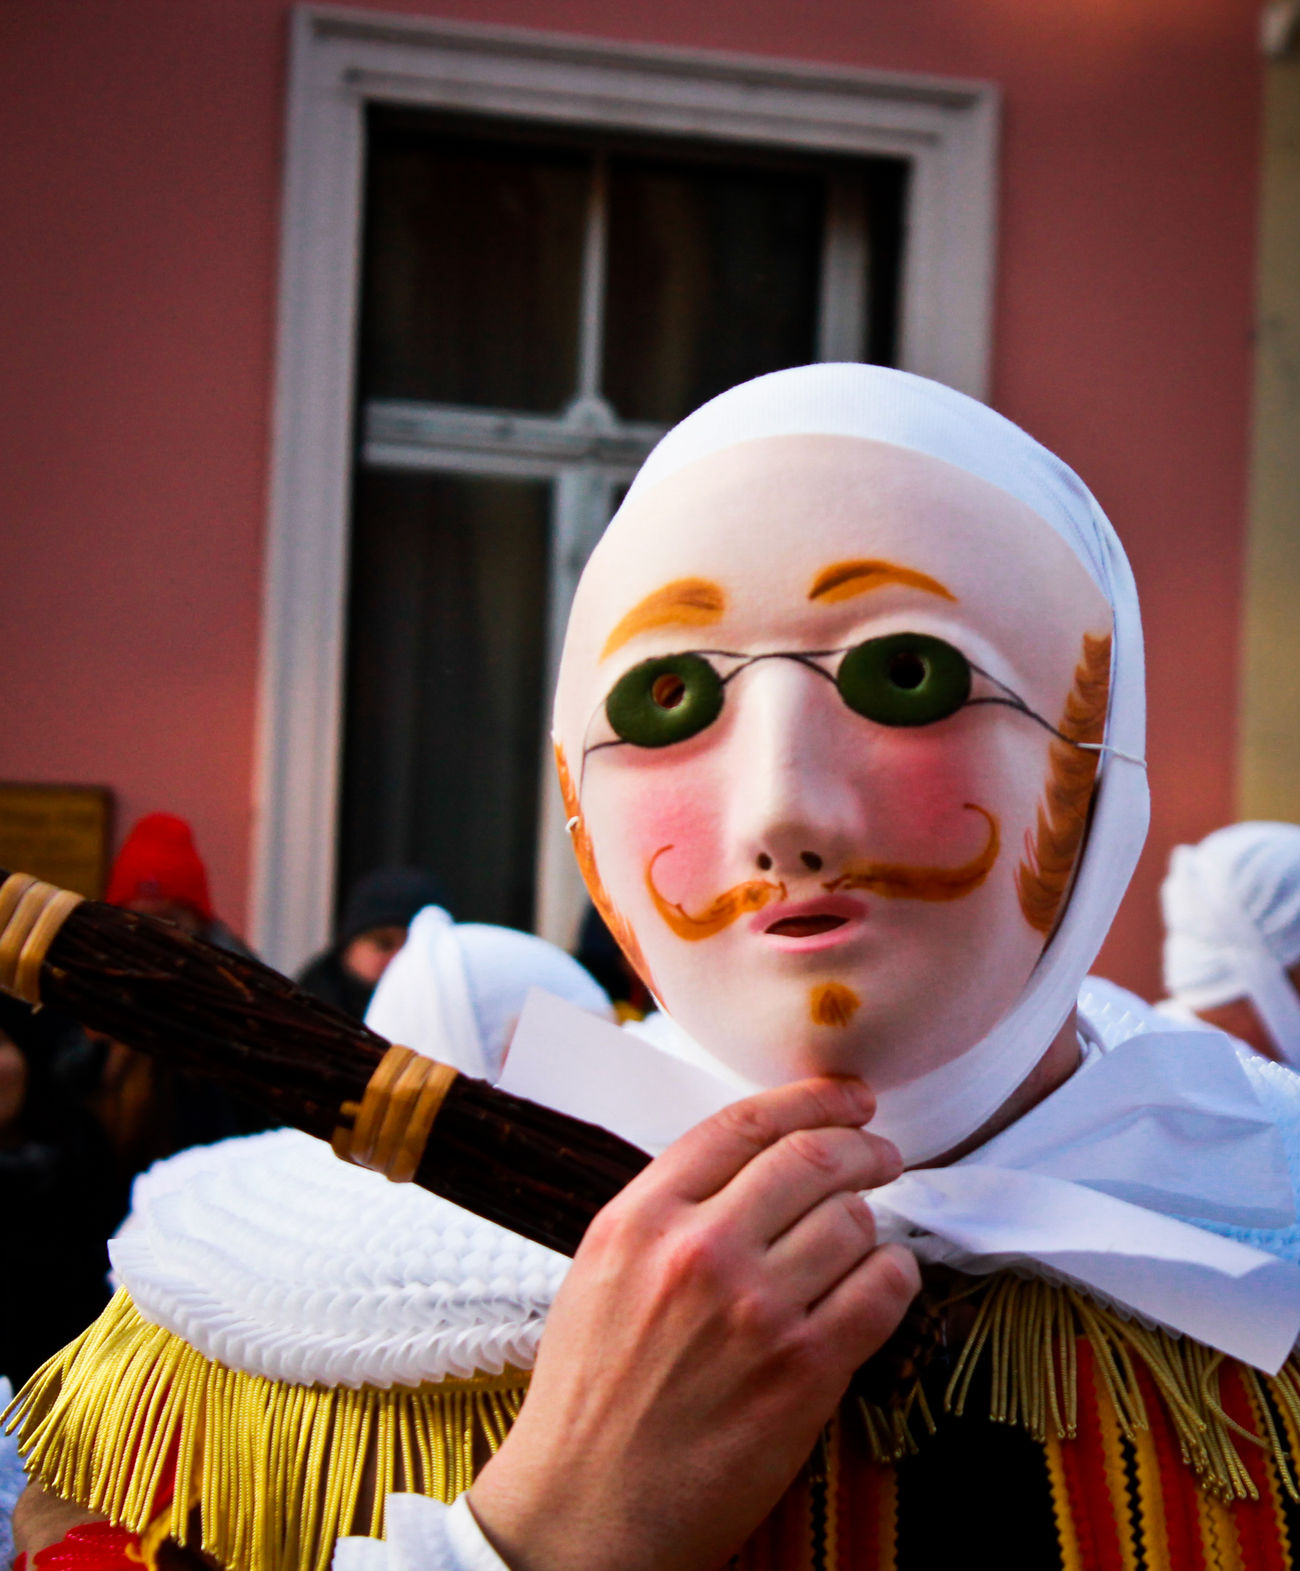 Binche Carnaval Belgium Deguisement 2013 Streetphotography Street Photography